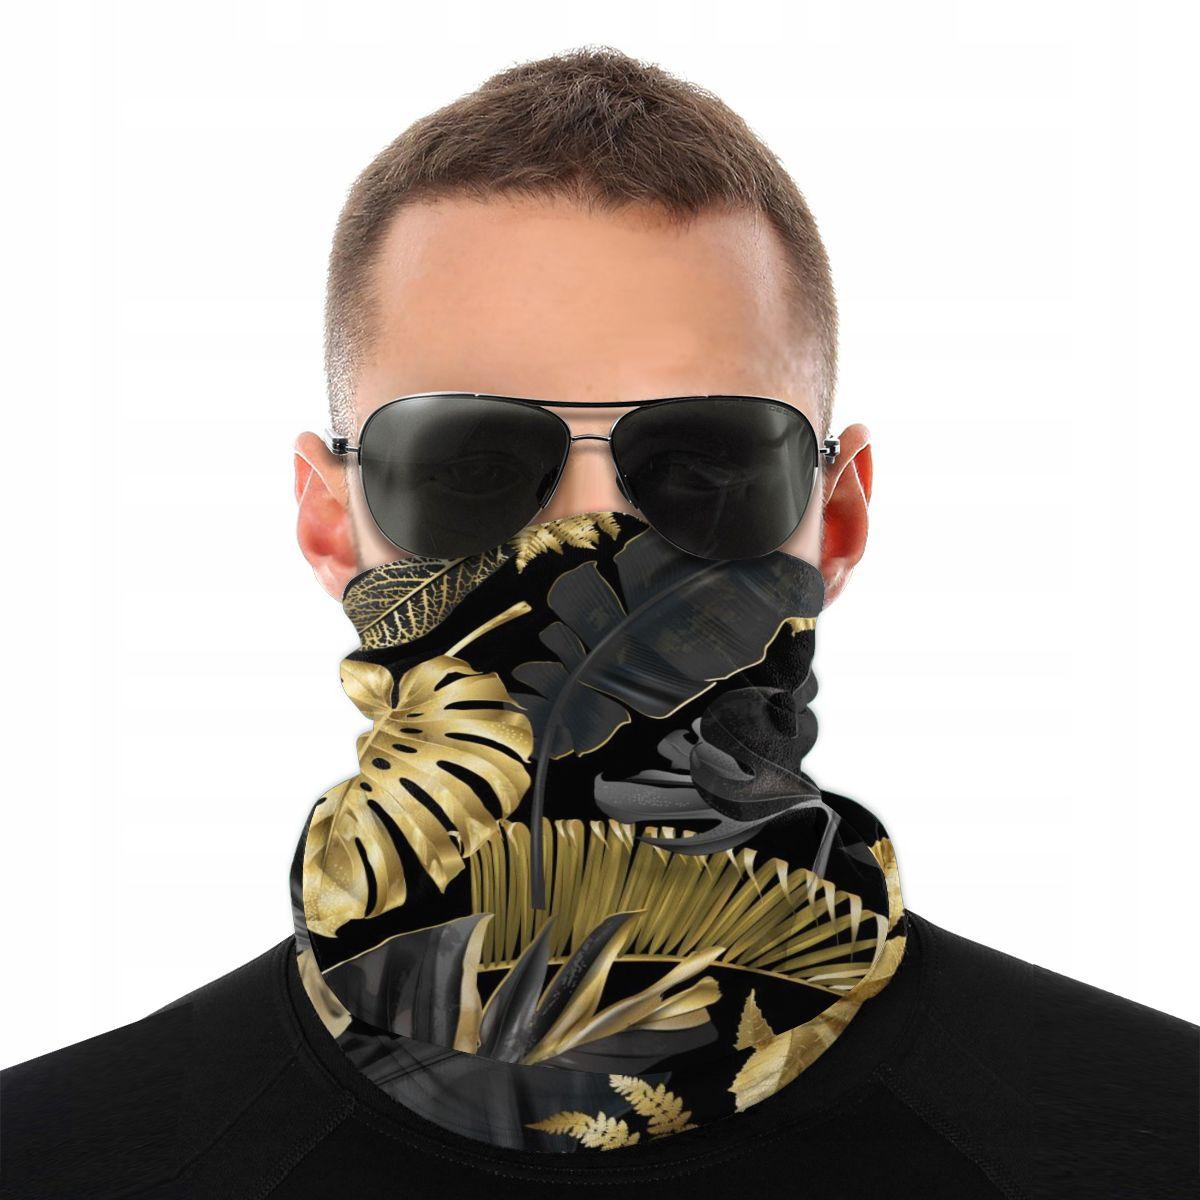 Bandana Neck Gaiter Headband Cycling Fishing Mask Scarf BotanicalTropical Leaves Multifunctional Outdoor Headwear